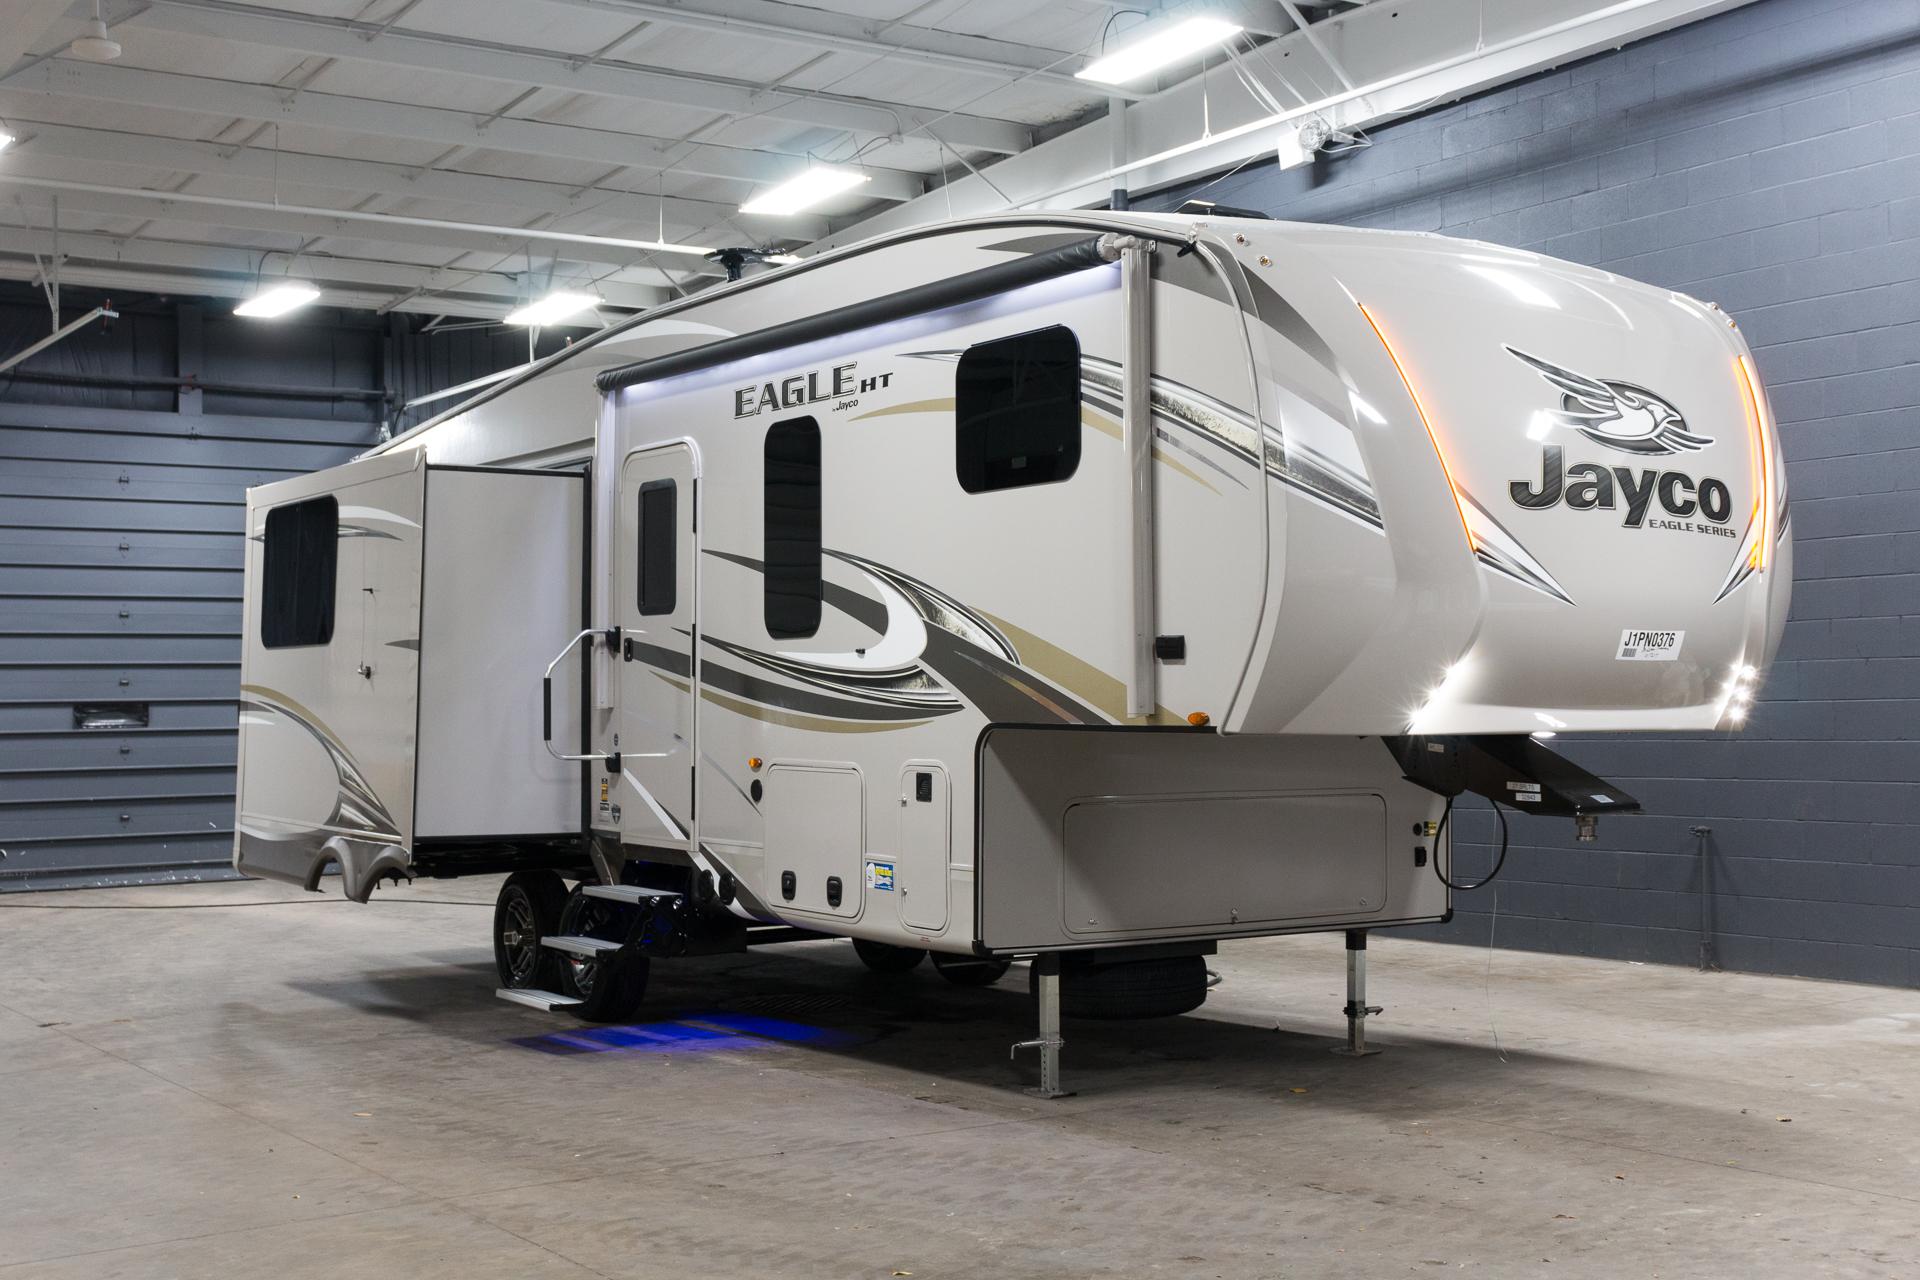 Buy new 2018 eagle ht 27 5rlts luxury 5th wheel travel for Xyz motors grand rapids